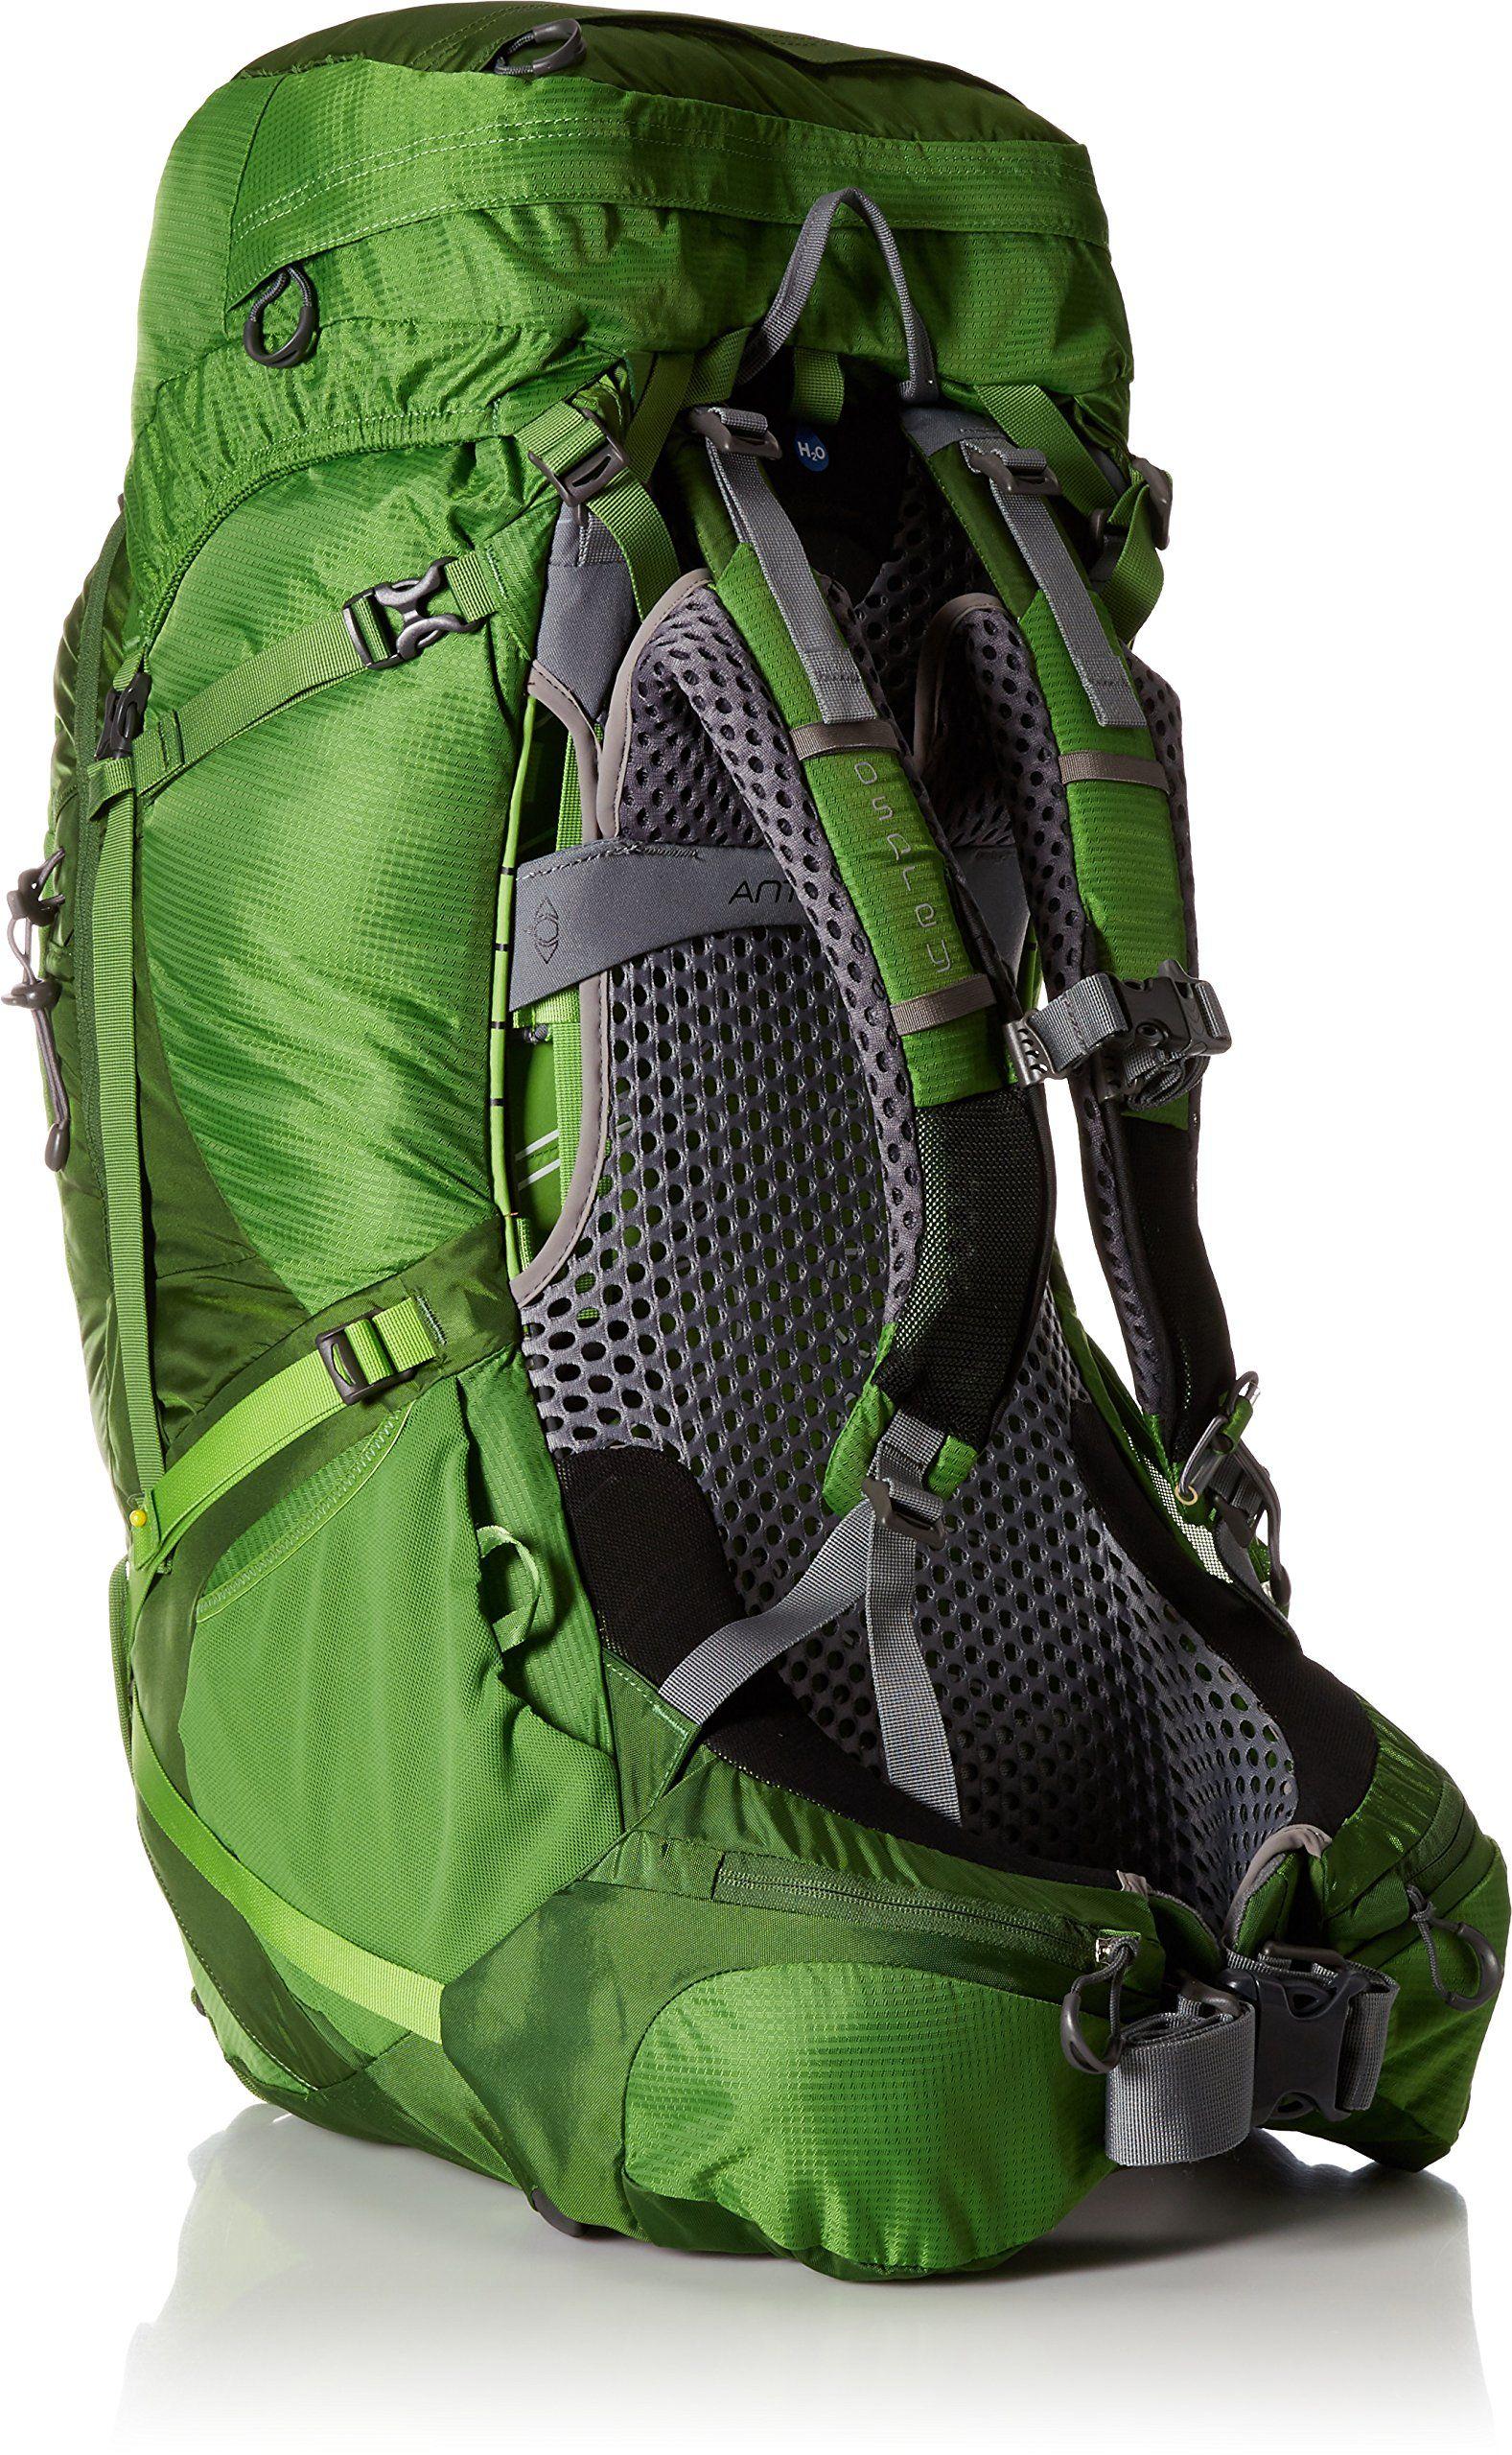 872b6fbc2ed Amazon.com : Osprey Men's Atmos 65 AG Backpacks : Sports & Outdoors ...